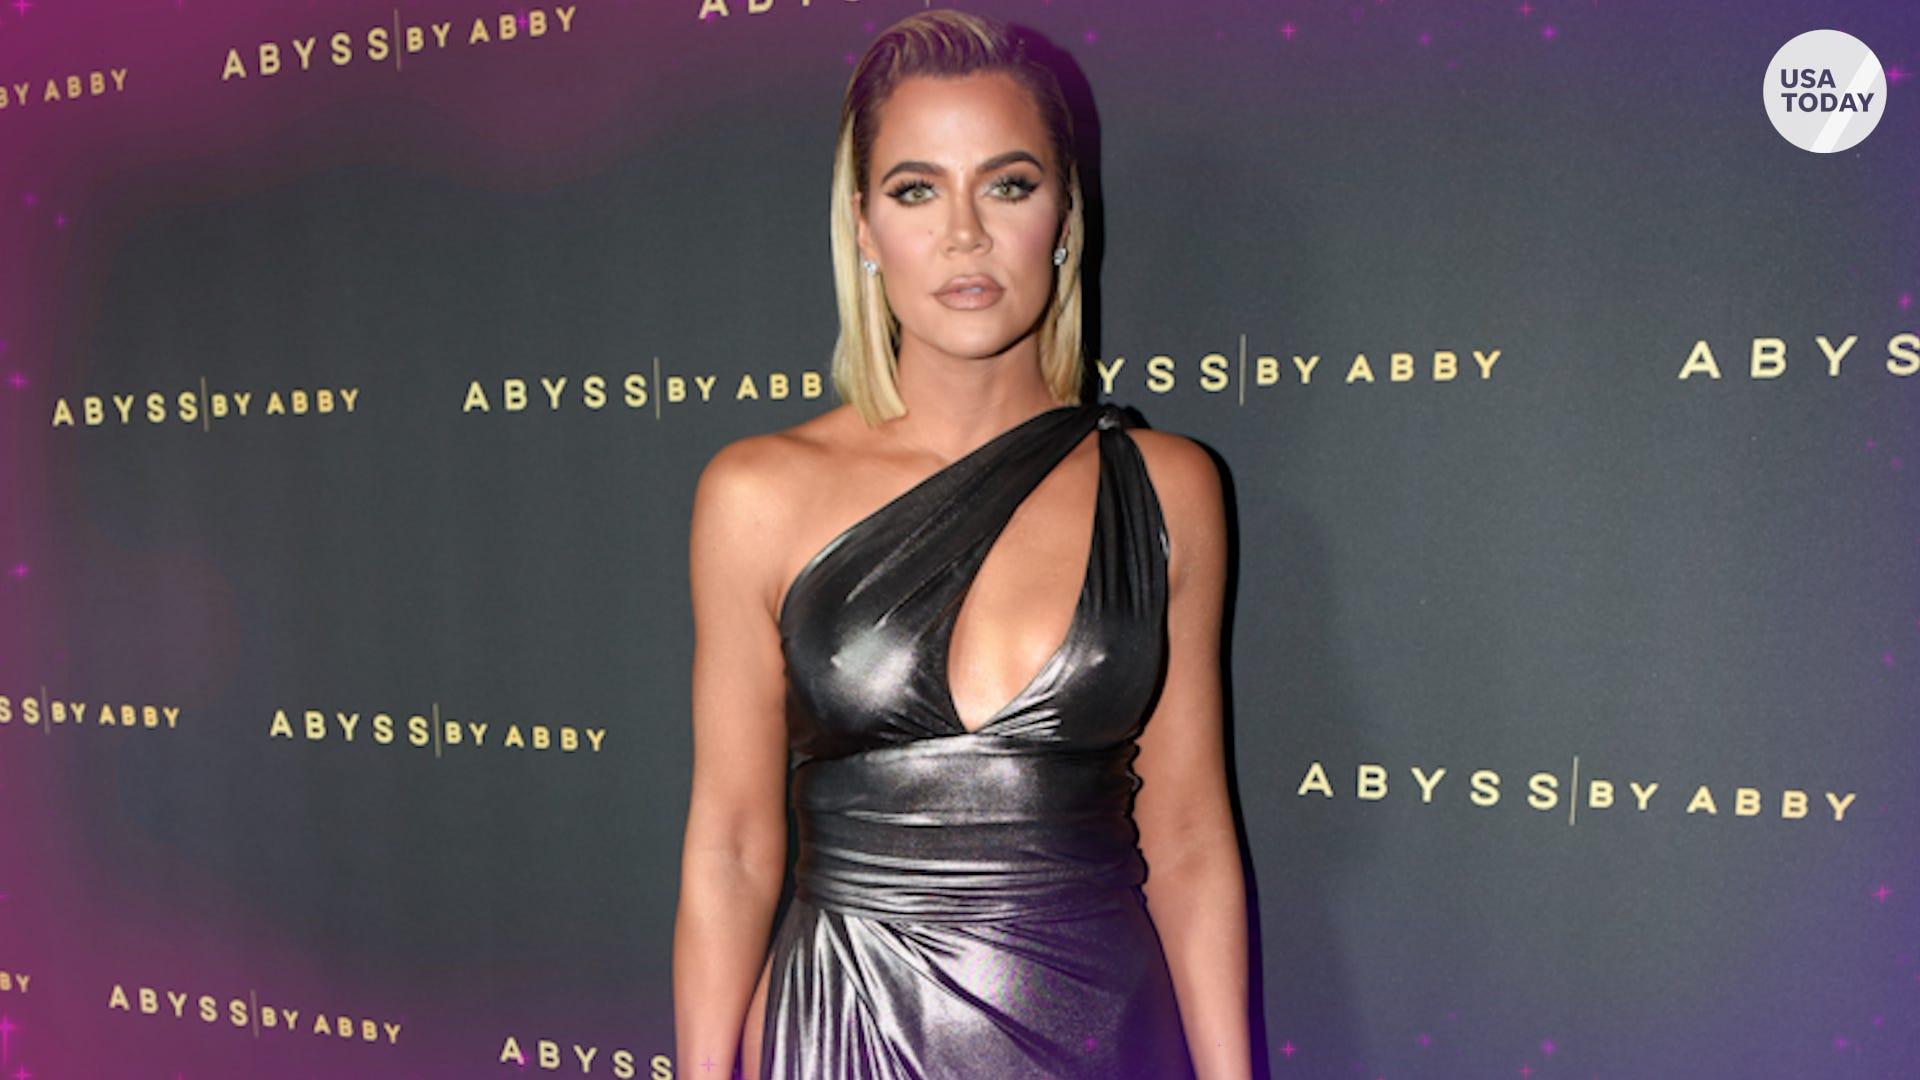 Khloé Kardashian's unedited bikini photo sparks conversation about beauty standards